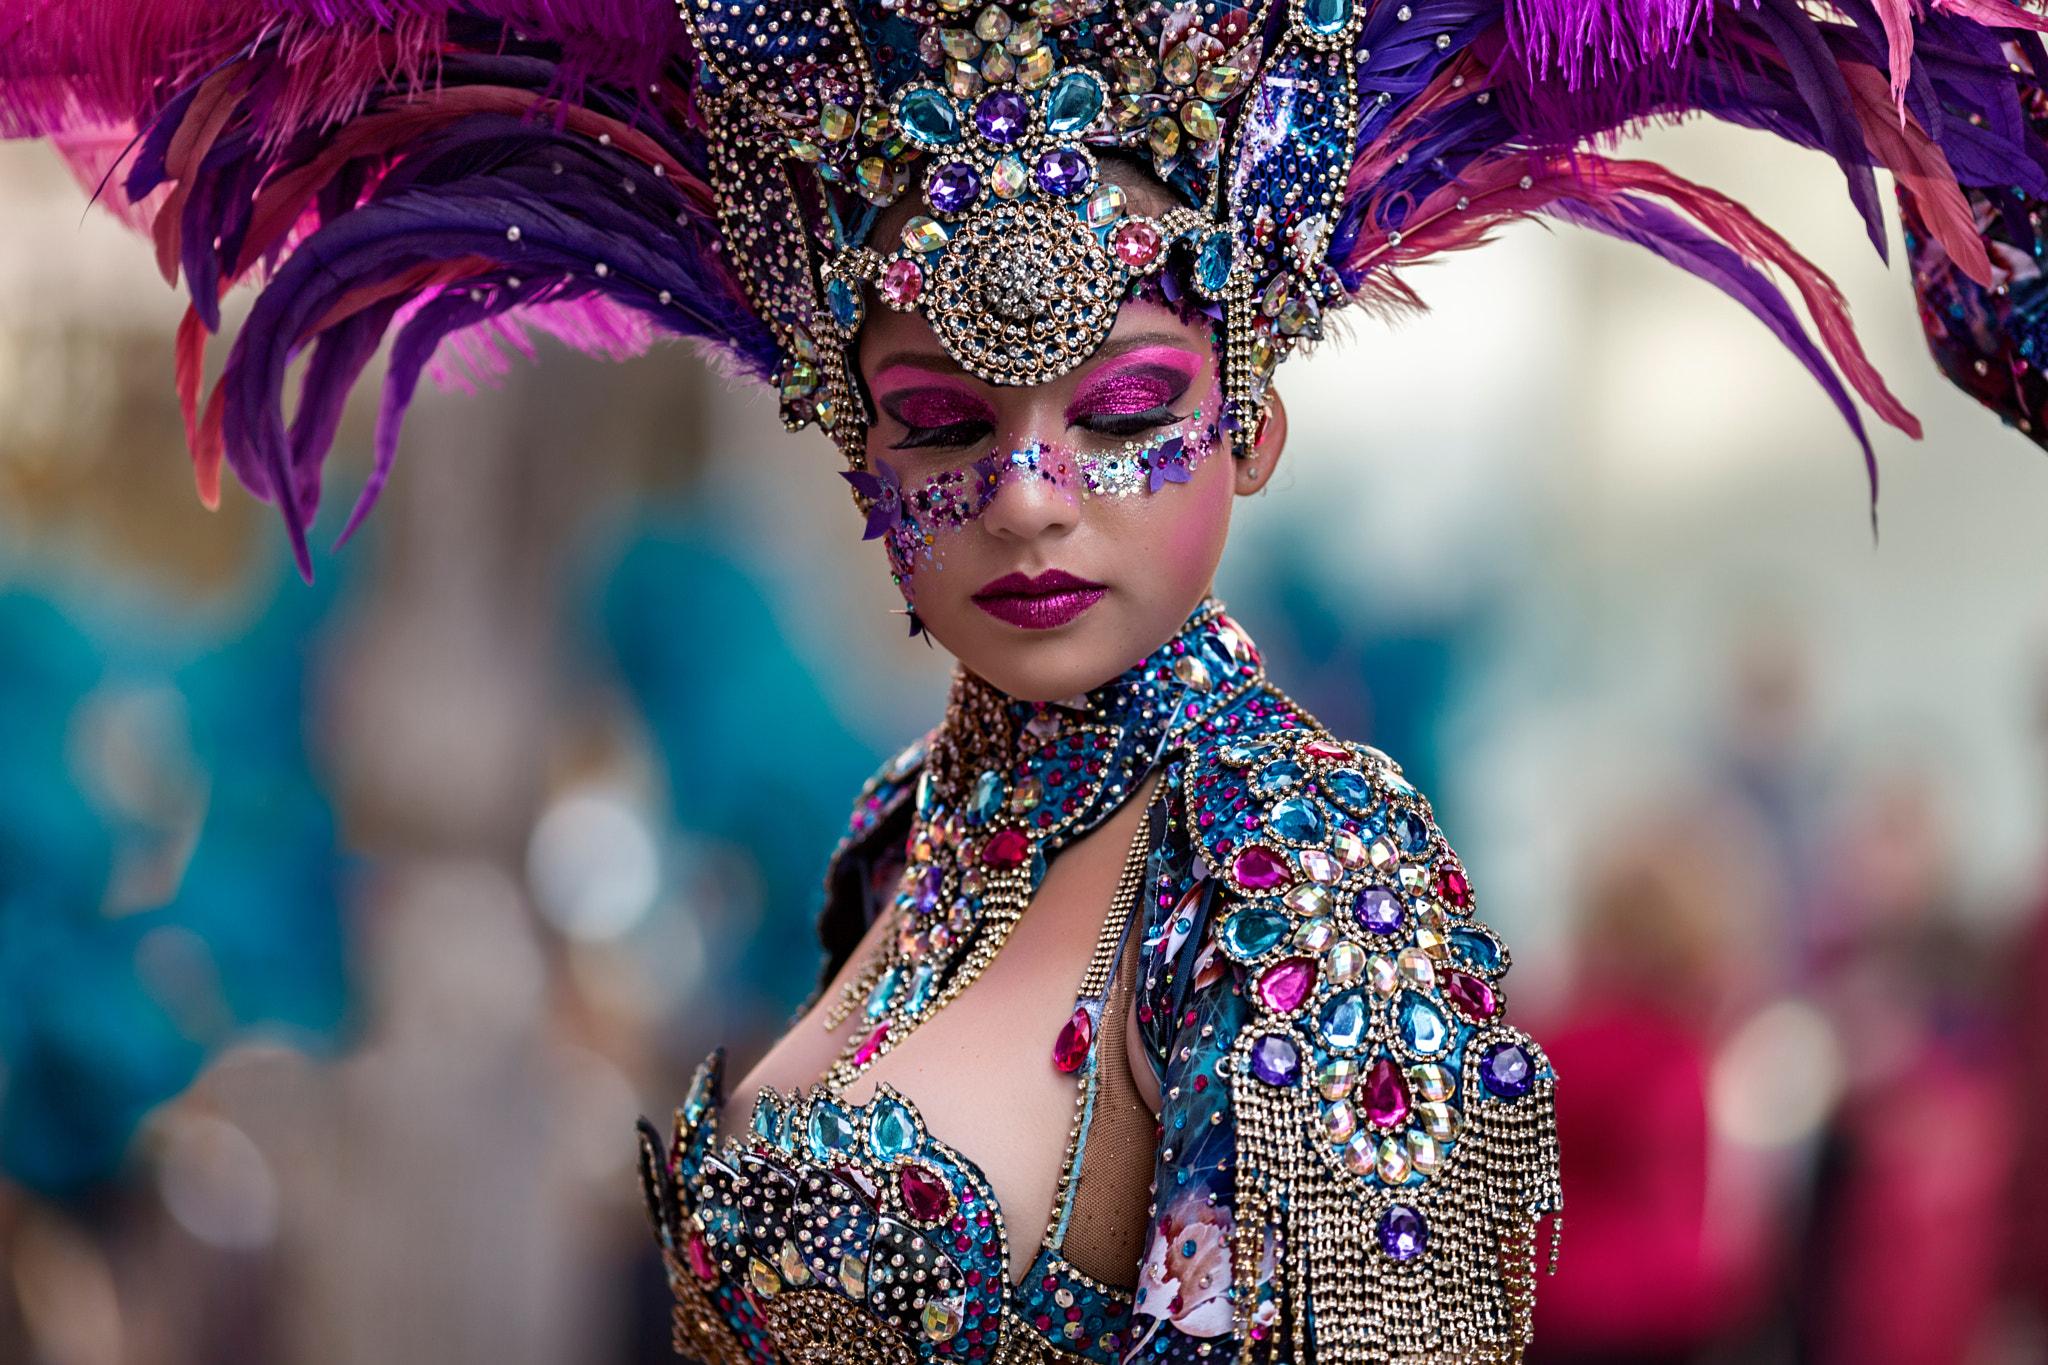 People 2048x1365 Vicente Concha women makeup eyeshadow pink purple jewelry gems glamour blush carnivals amethyst sapphire